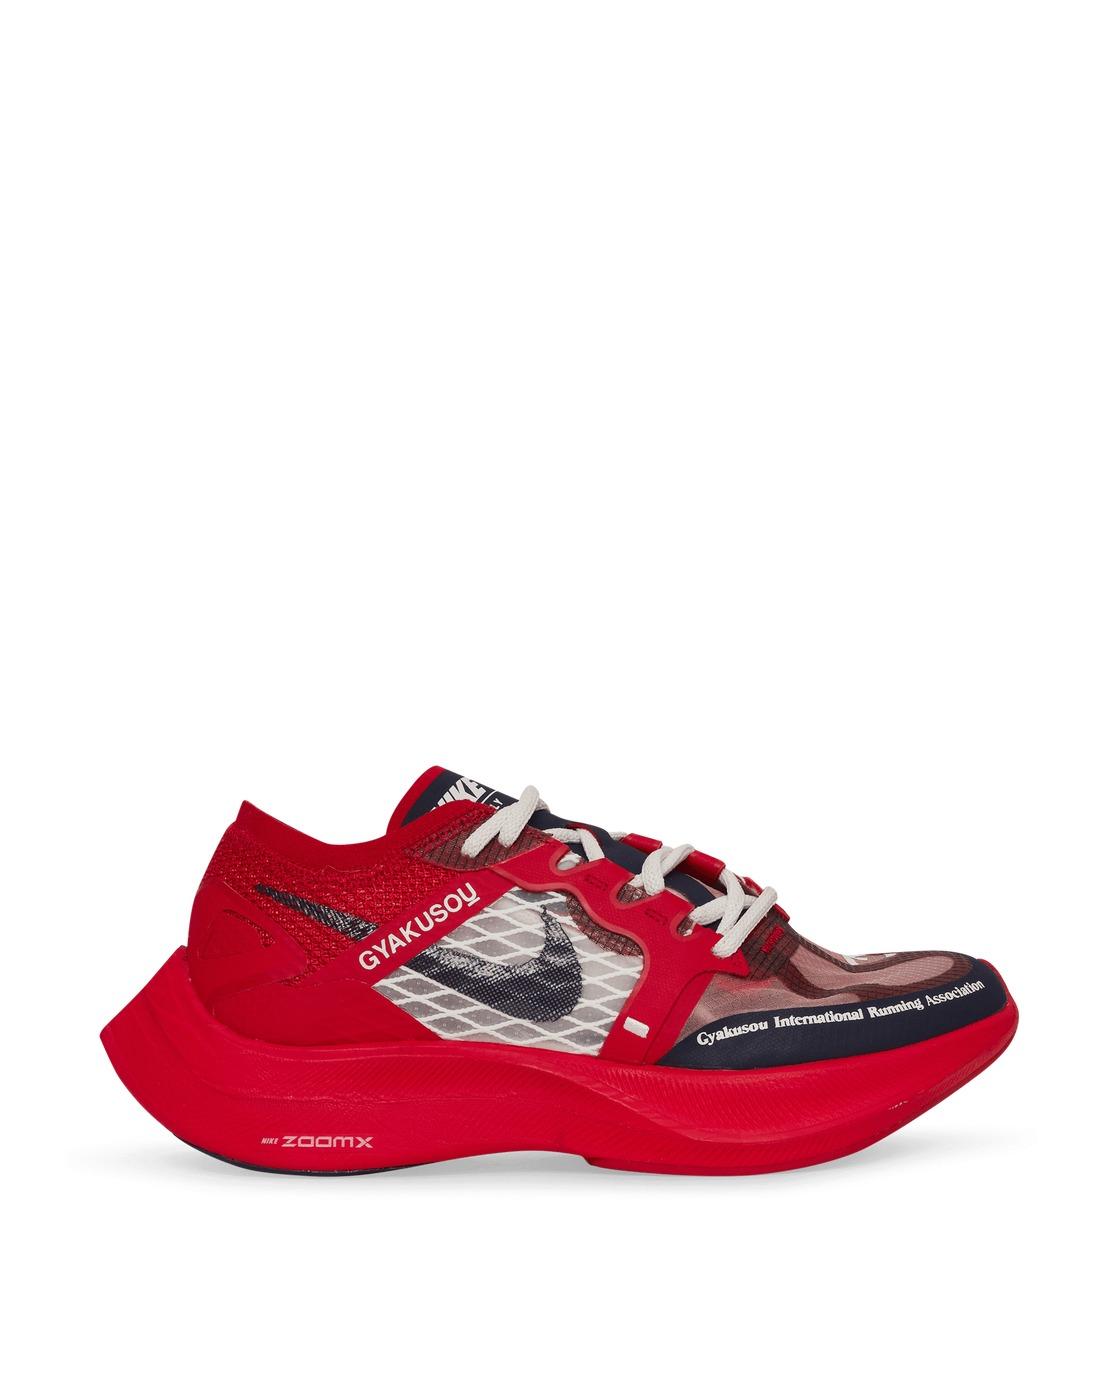 Photo: Nikelab X Undercover Gyakusou Gyakusou Zoomx Vaporfly Next% Sneakers University Red/Blackened Blue